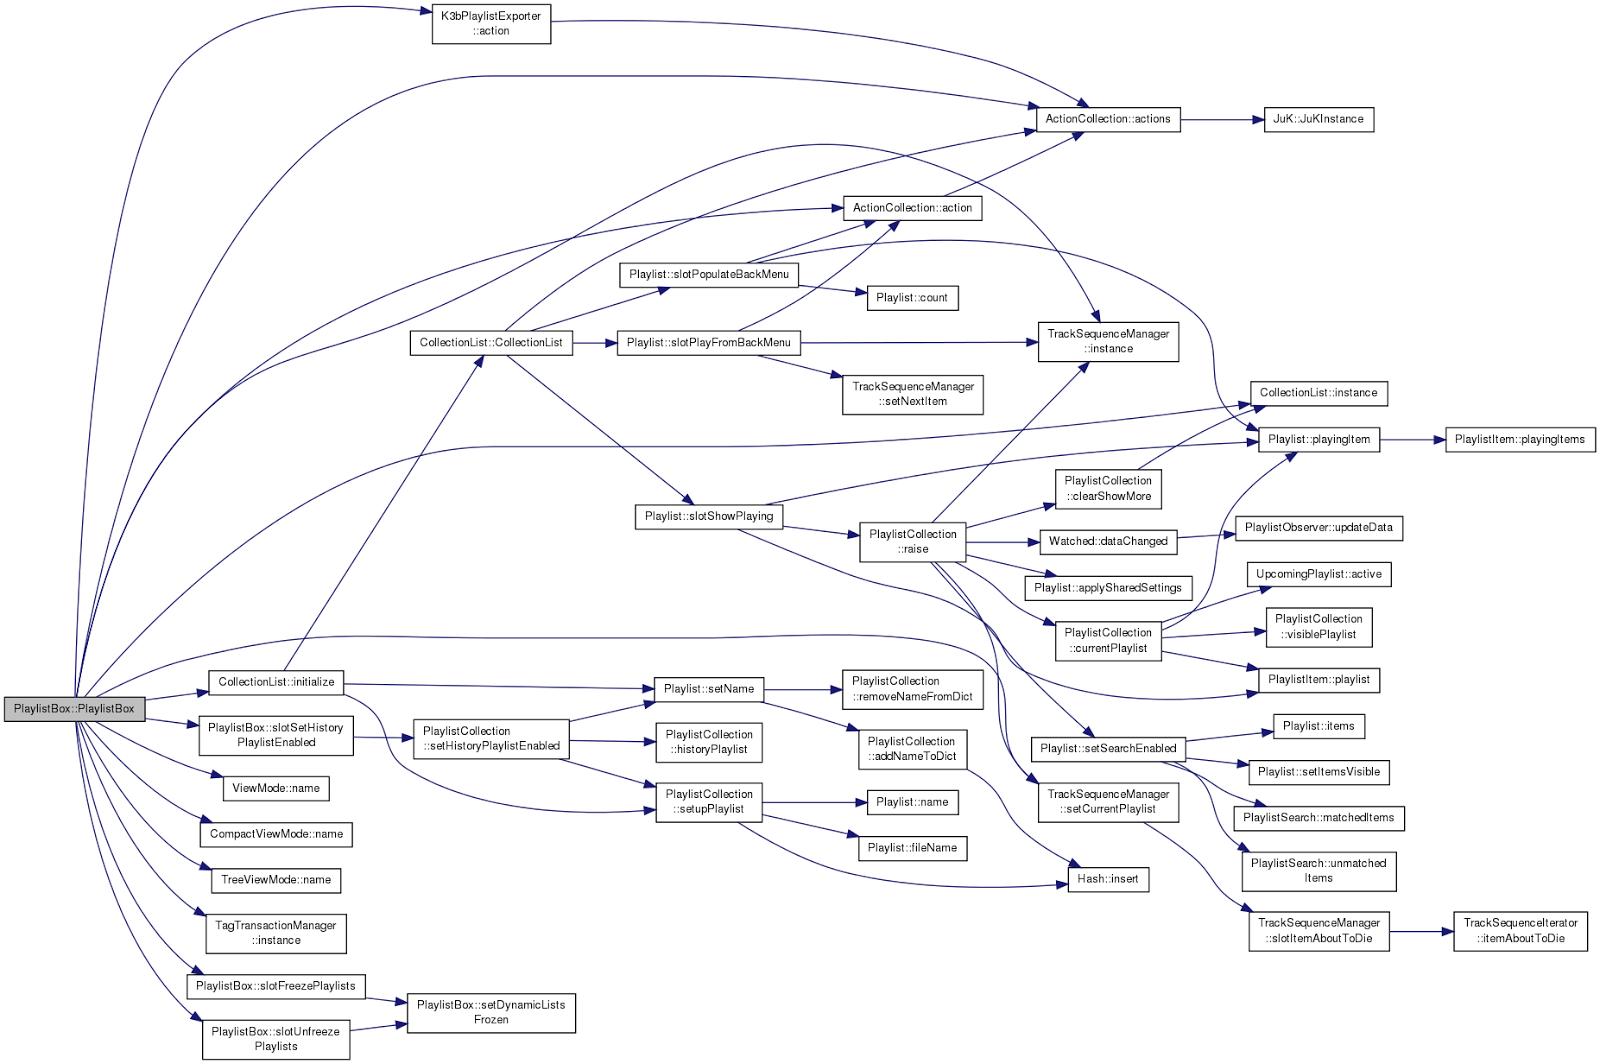 hvac electrical diagram tool